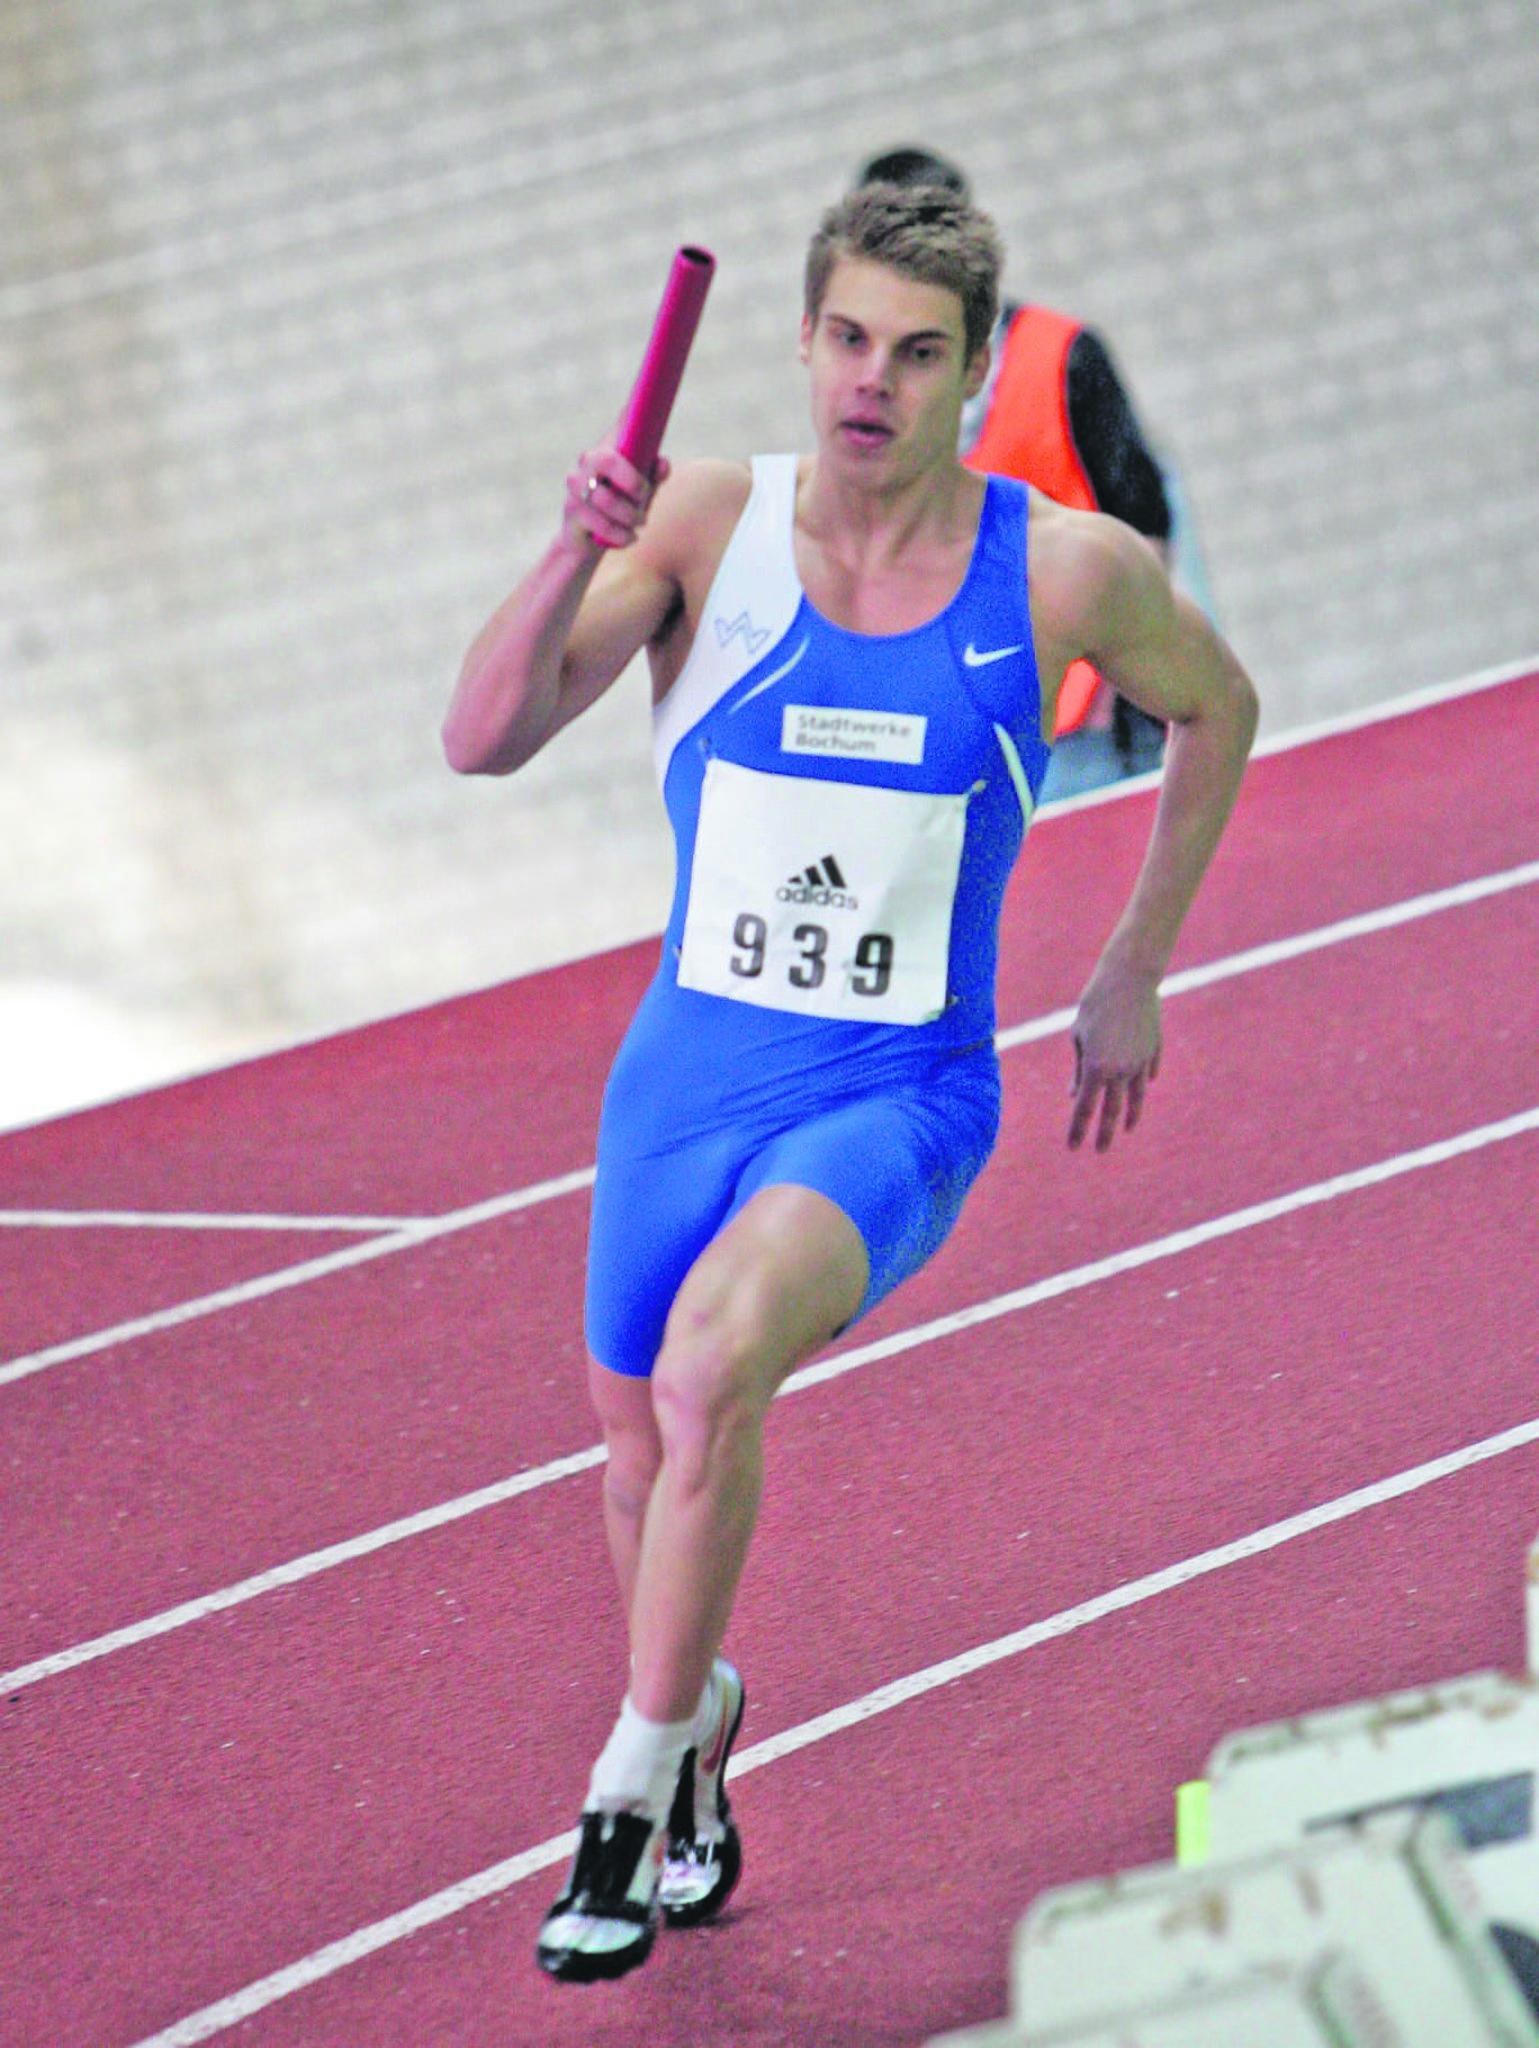 Leichtathletik Sprinter Julian Reus Sorgte Fur Das Highlight Wattenscheid